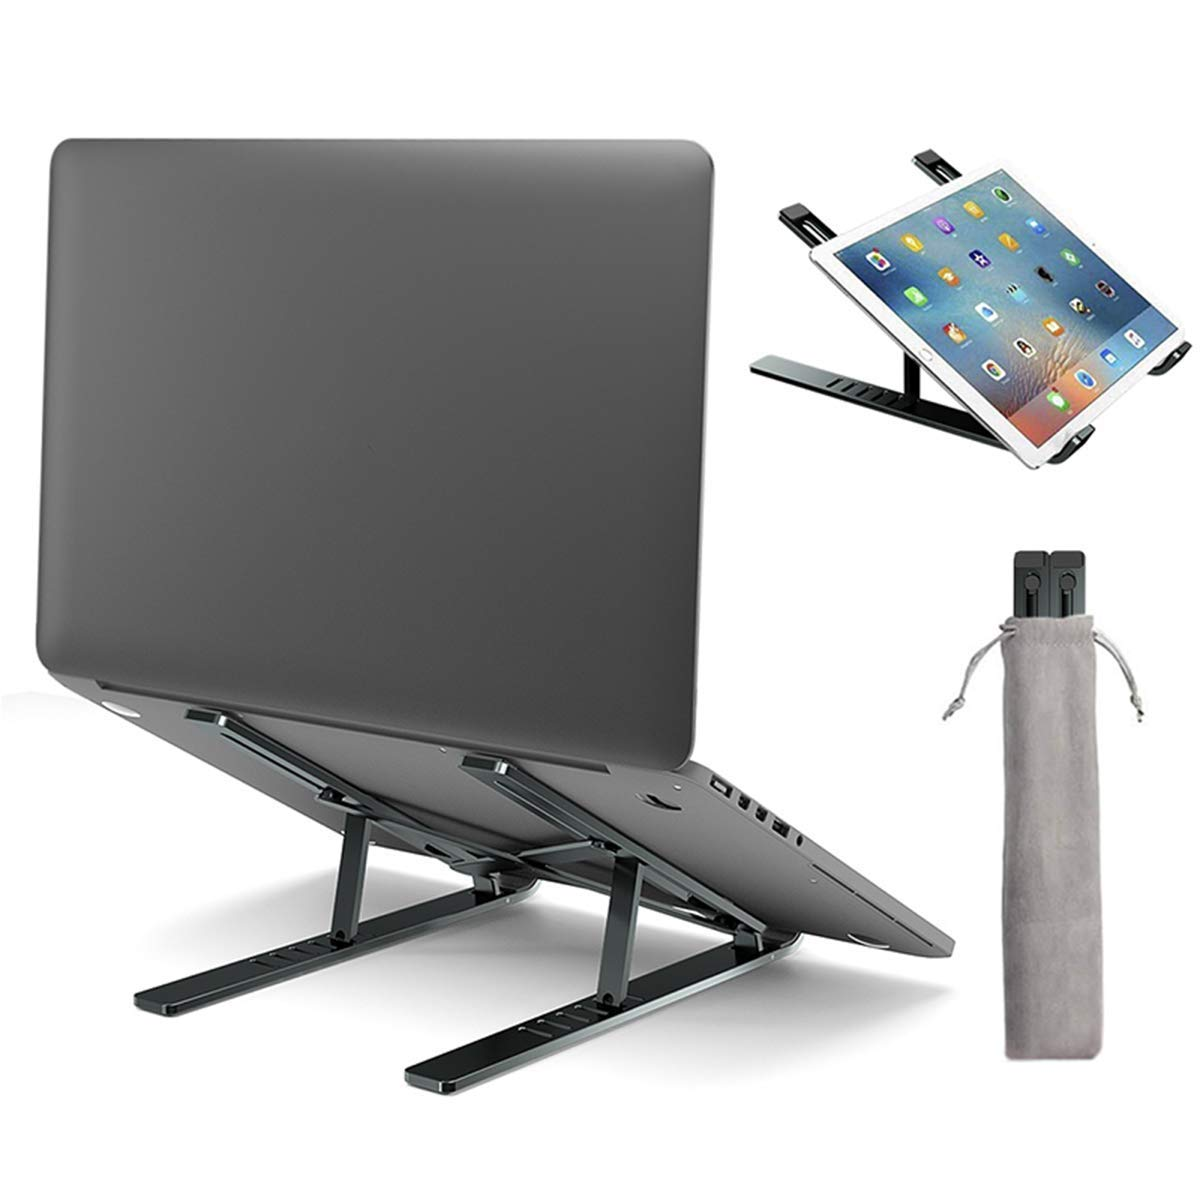 Laptop Stand,Laptop Holder Riser Computer Tablet Stand, 6 Angles Adjustable Foldable Portable Aluminum Ergonomic Desktop Holder Compatible with MacBook,iPad, Dell, Lenovo(Gray)